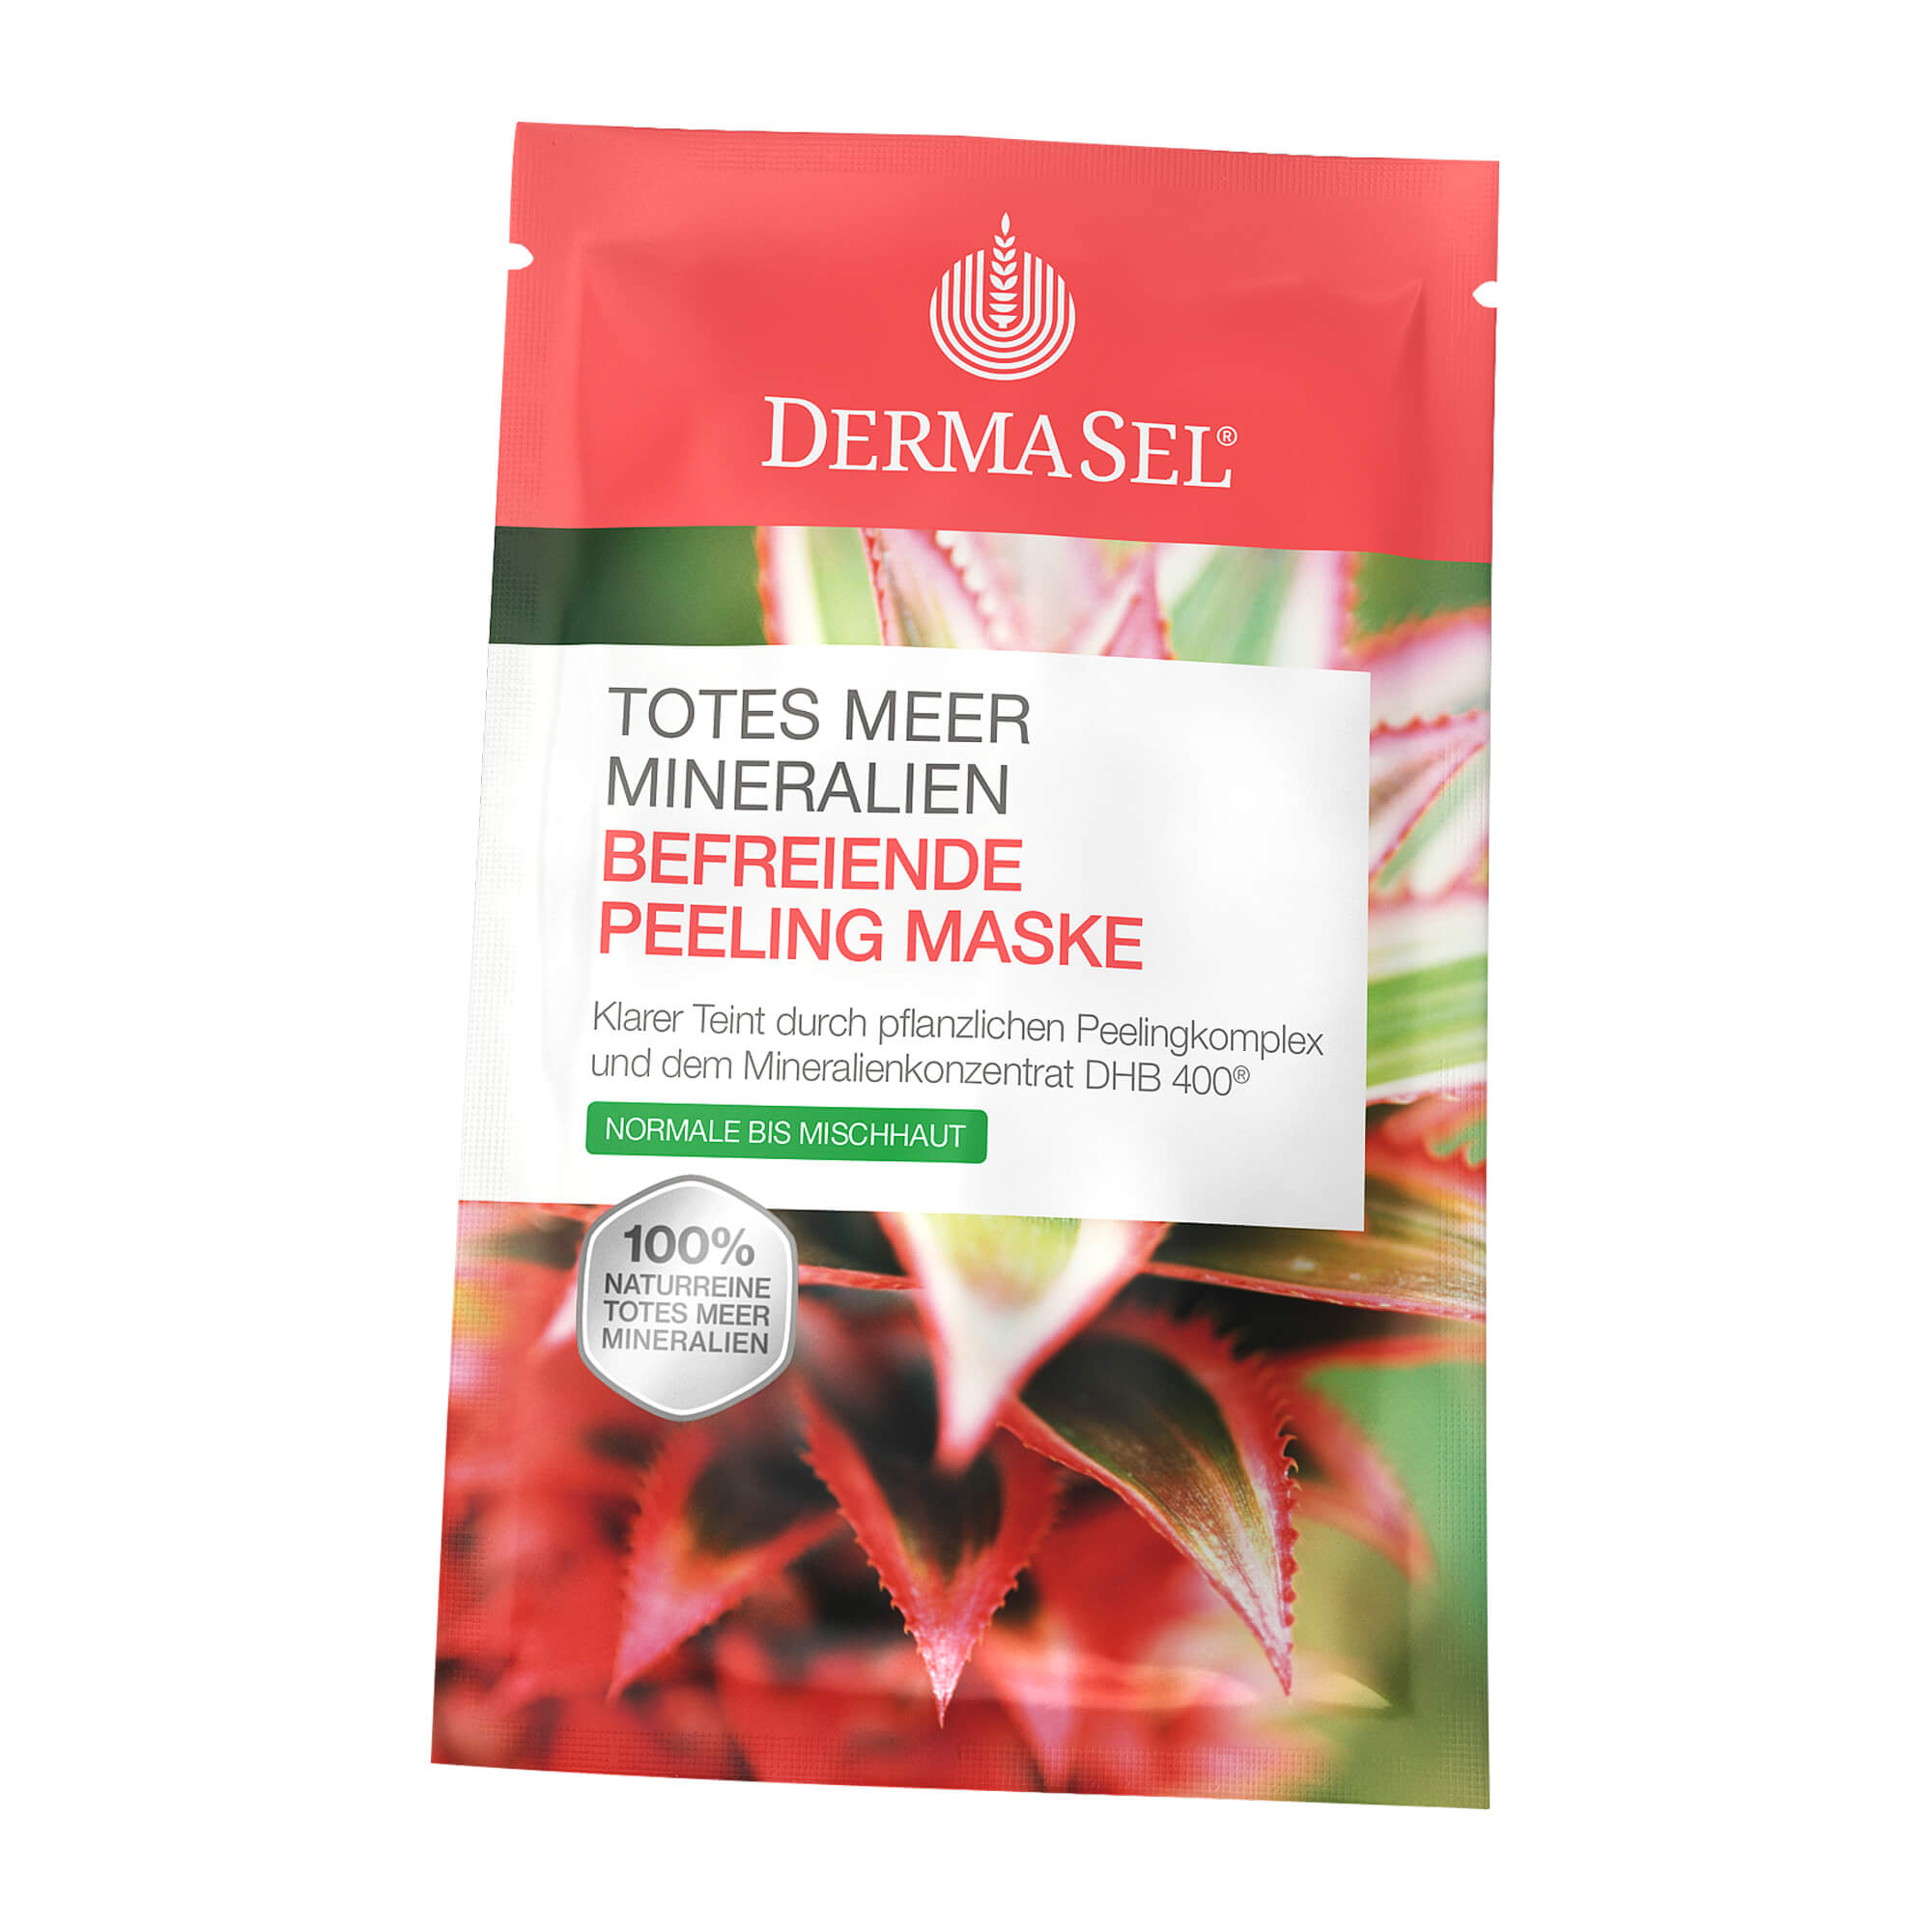 DermaSel Peeling Maske